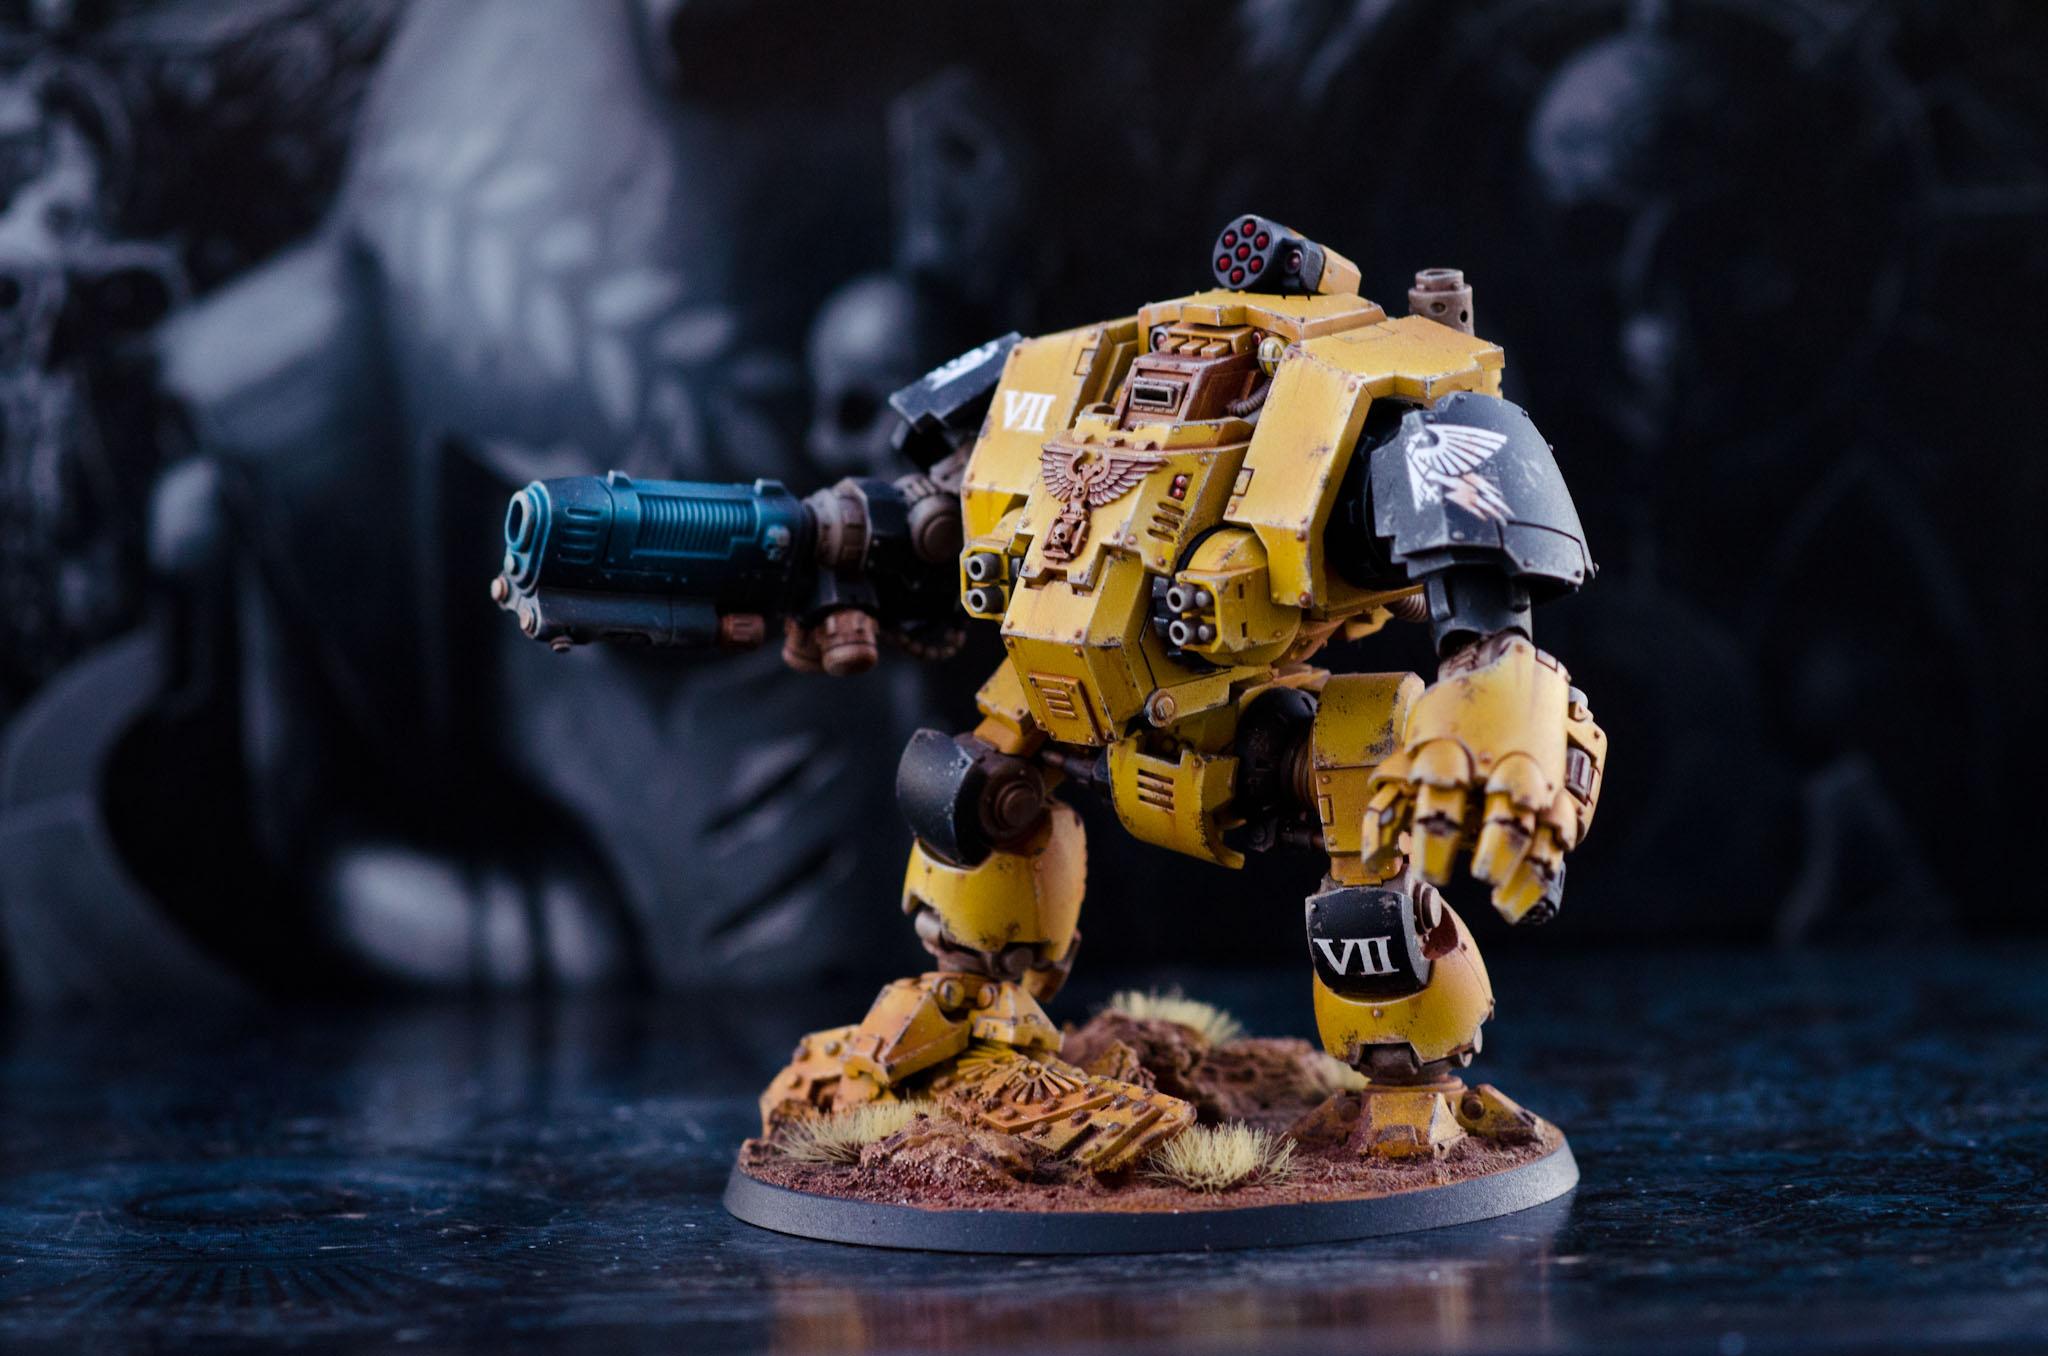 Imperial fist Primaris redemptor dreadnought